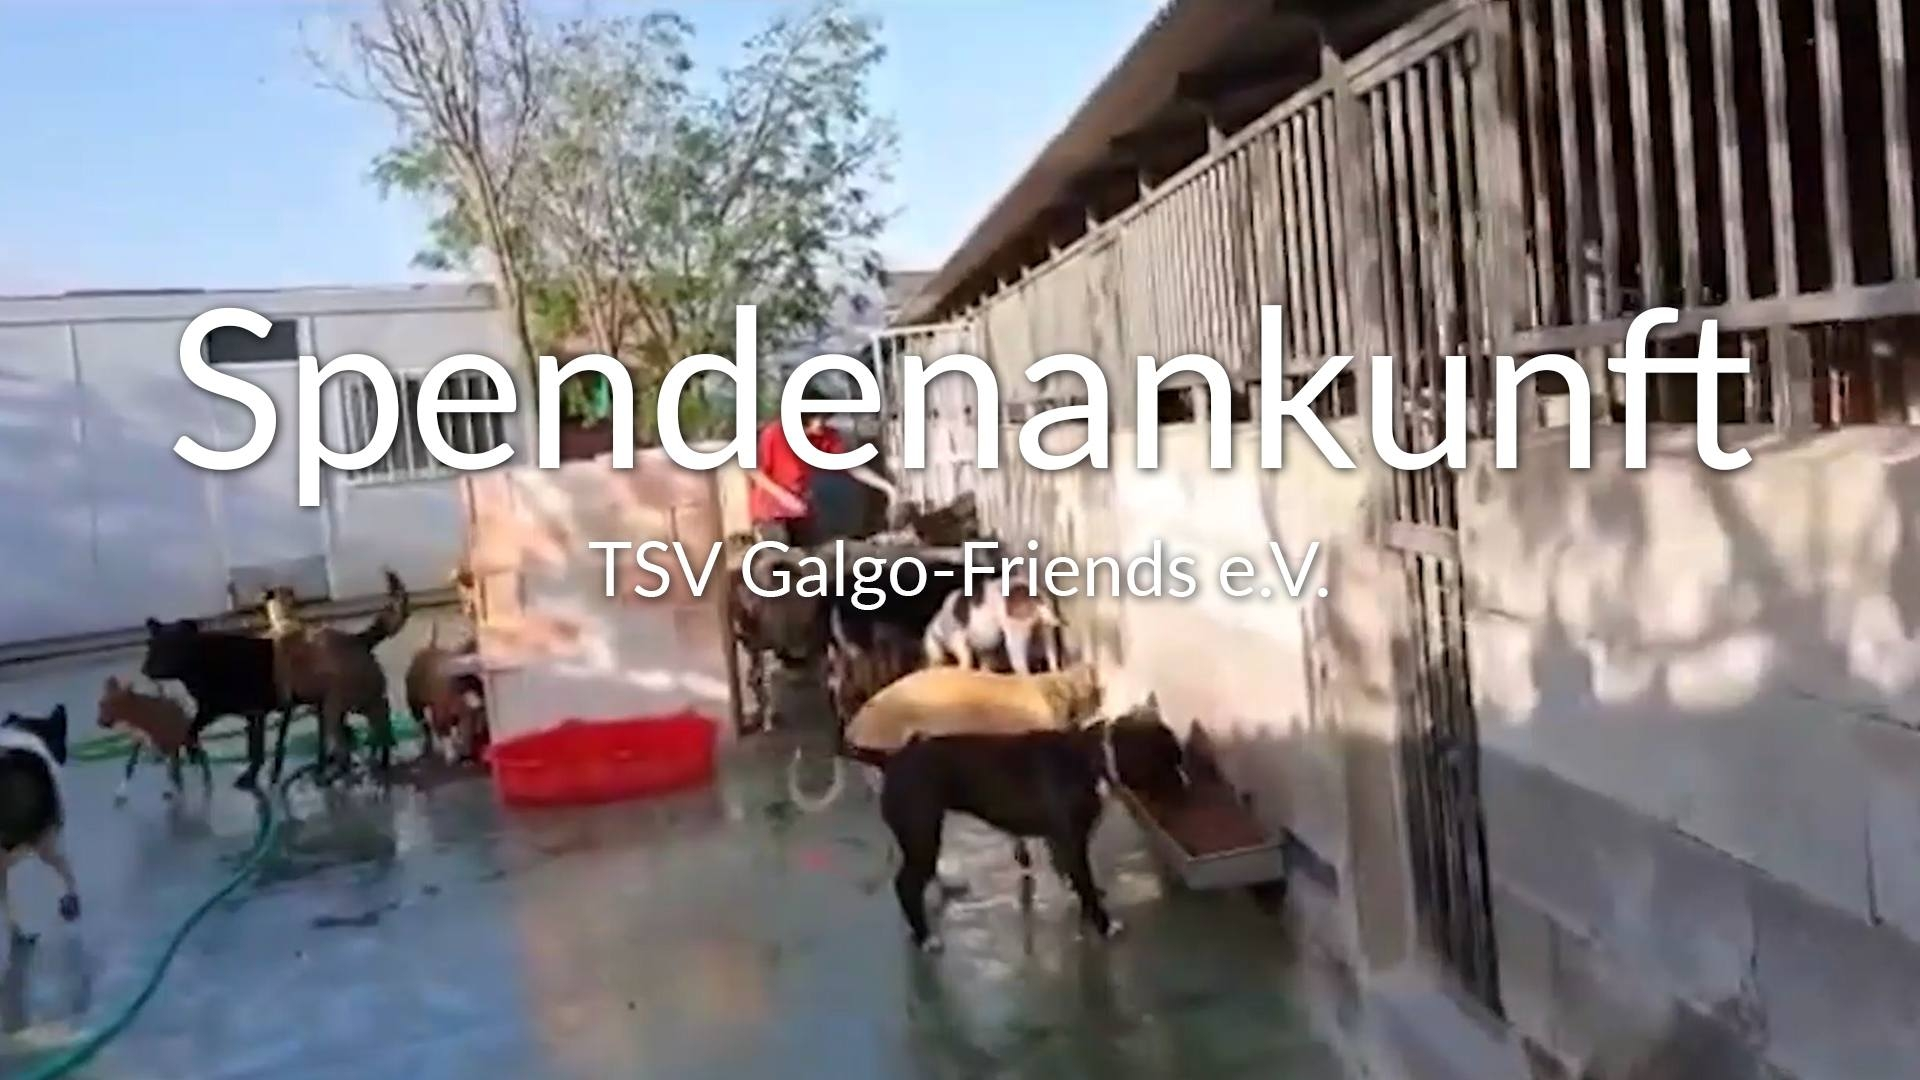 TSV Galgo-Friends eV_Galgo Aktion_Spanien